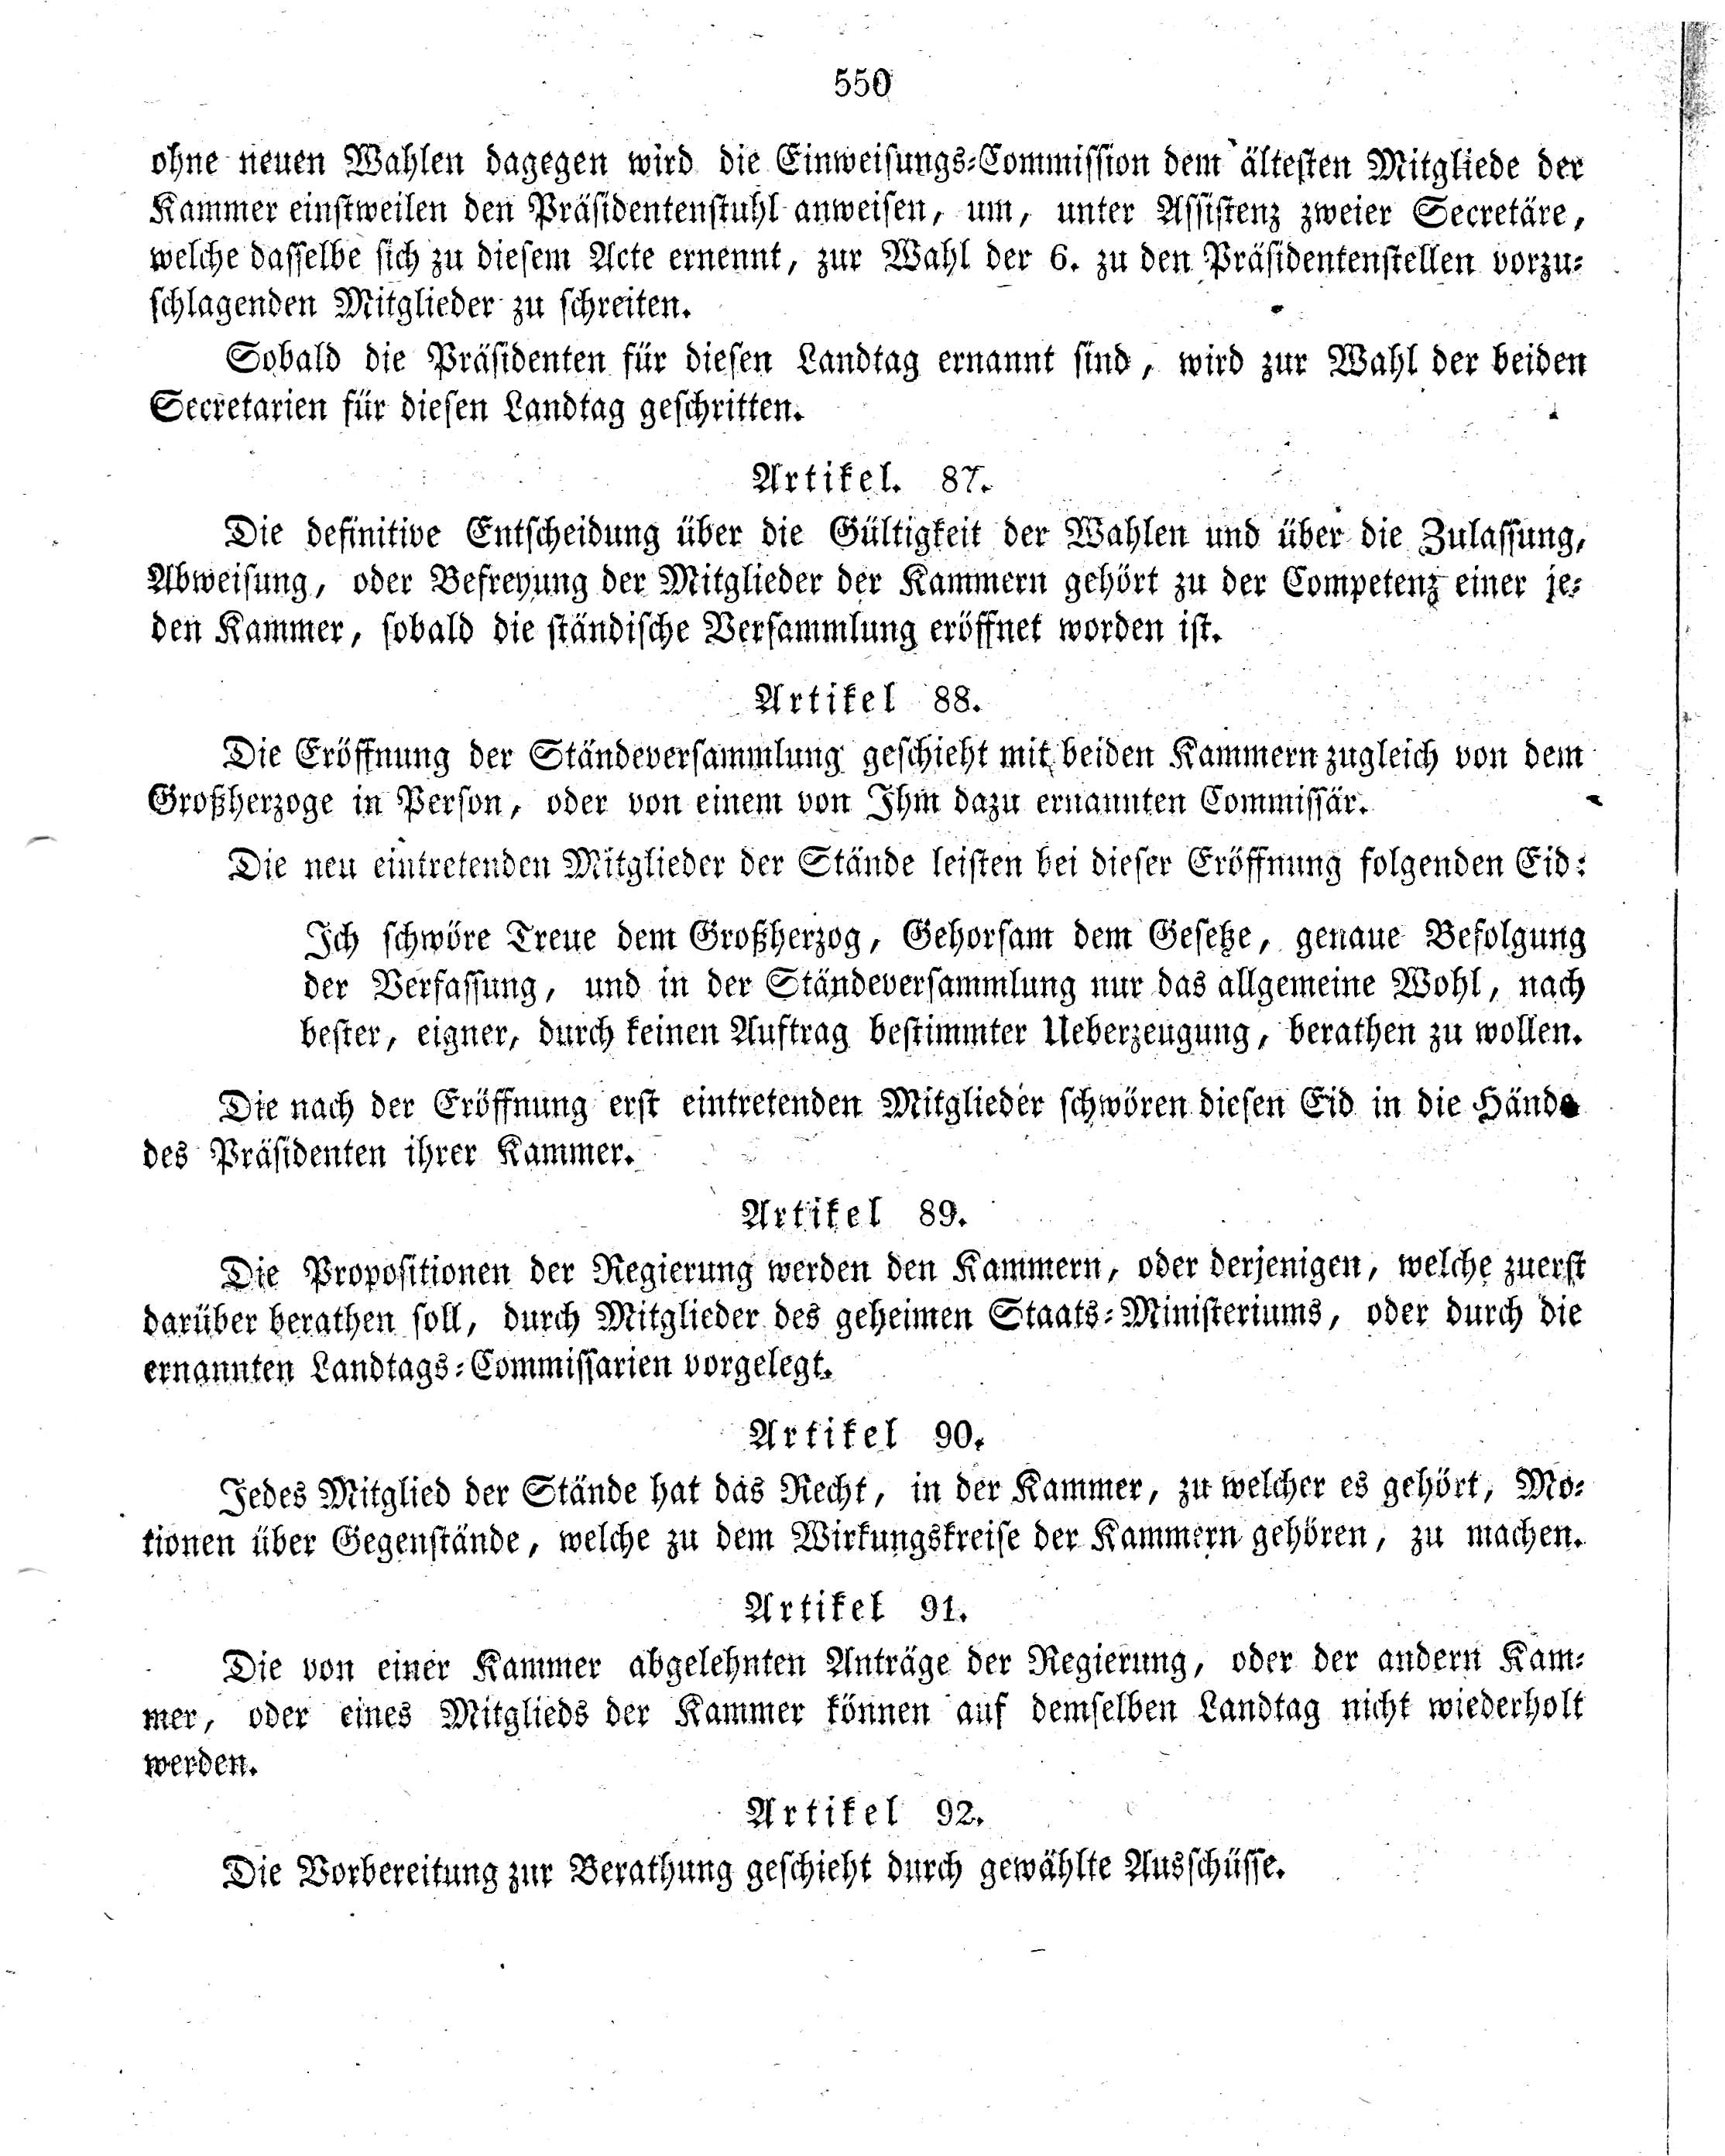 File:De Verfassungsurkunde (Großh Hess)(1820) 550.jpg - Wikimedia ...